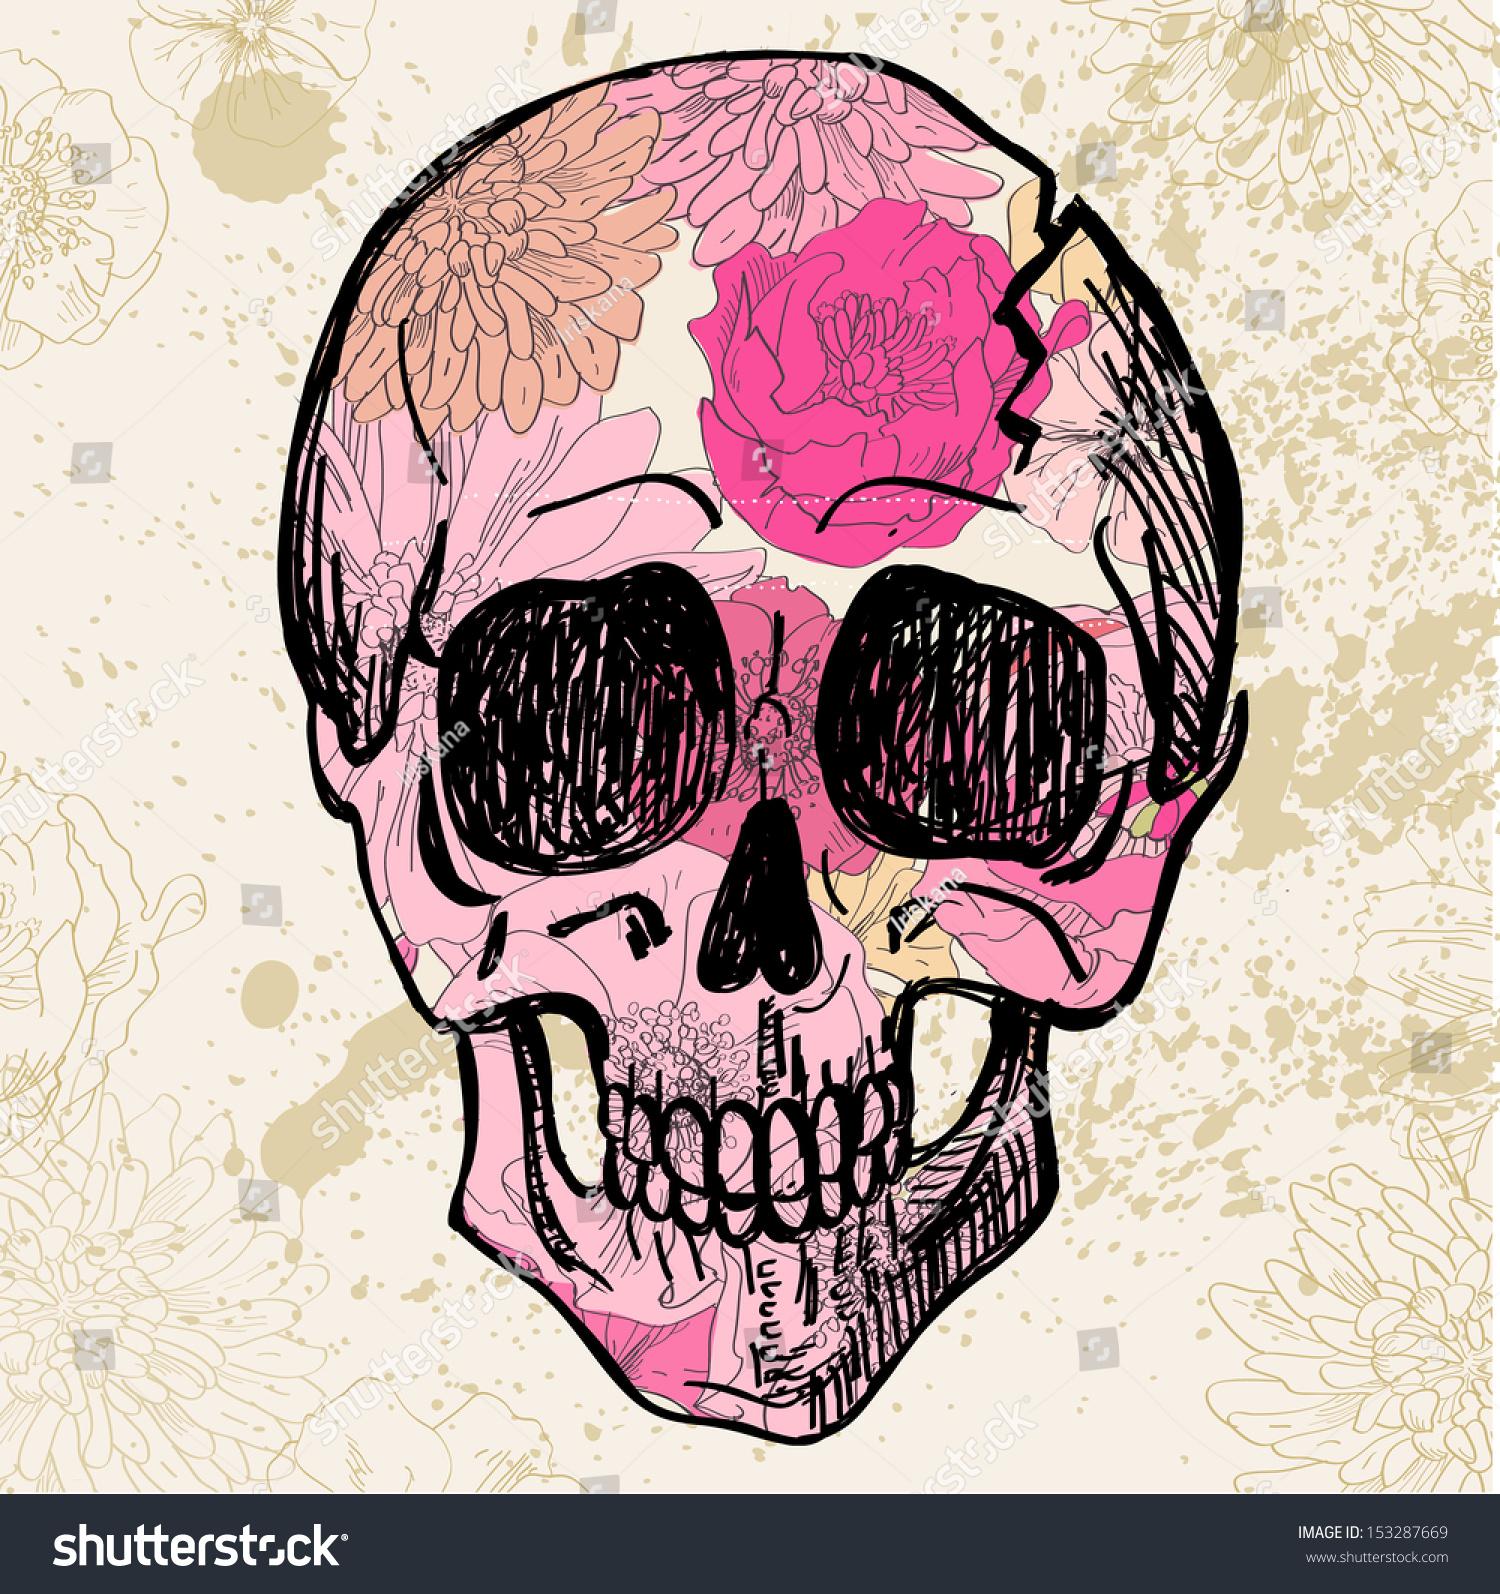 Vector skull pink flower pattern on stock vector 153287669 vector skull with pink flower pattern on textured background vintage illustration mightylinksfo